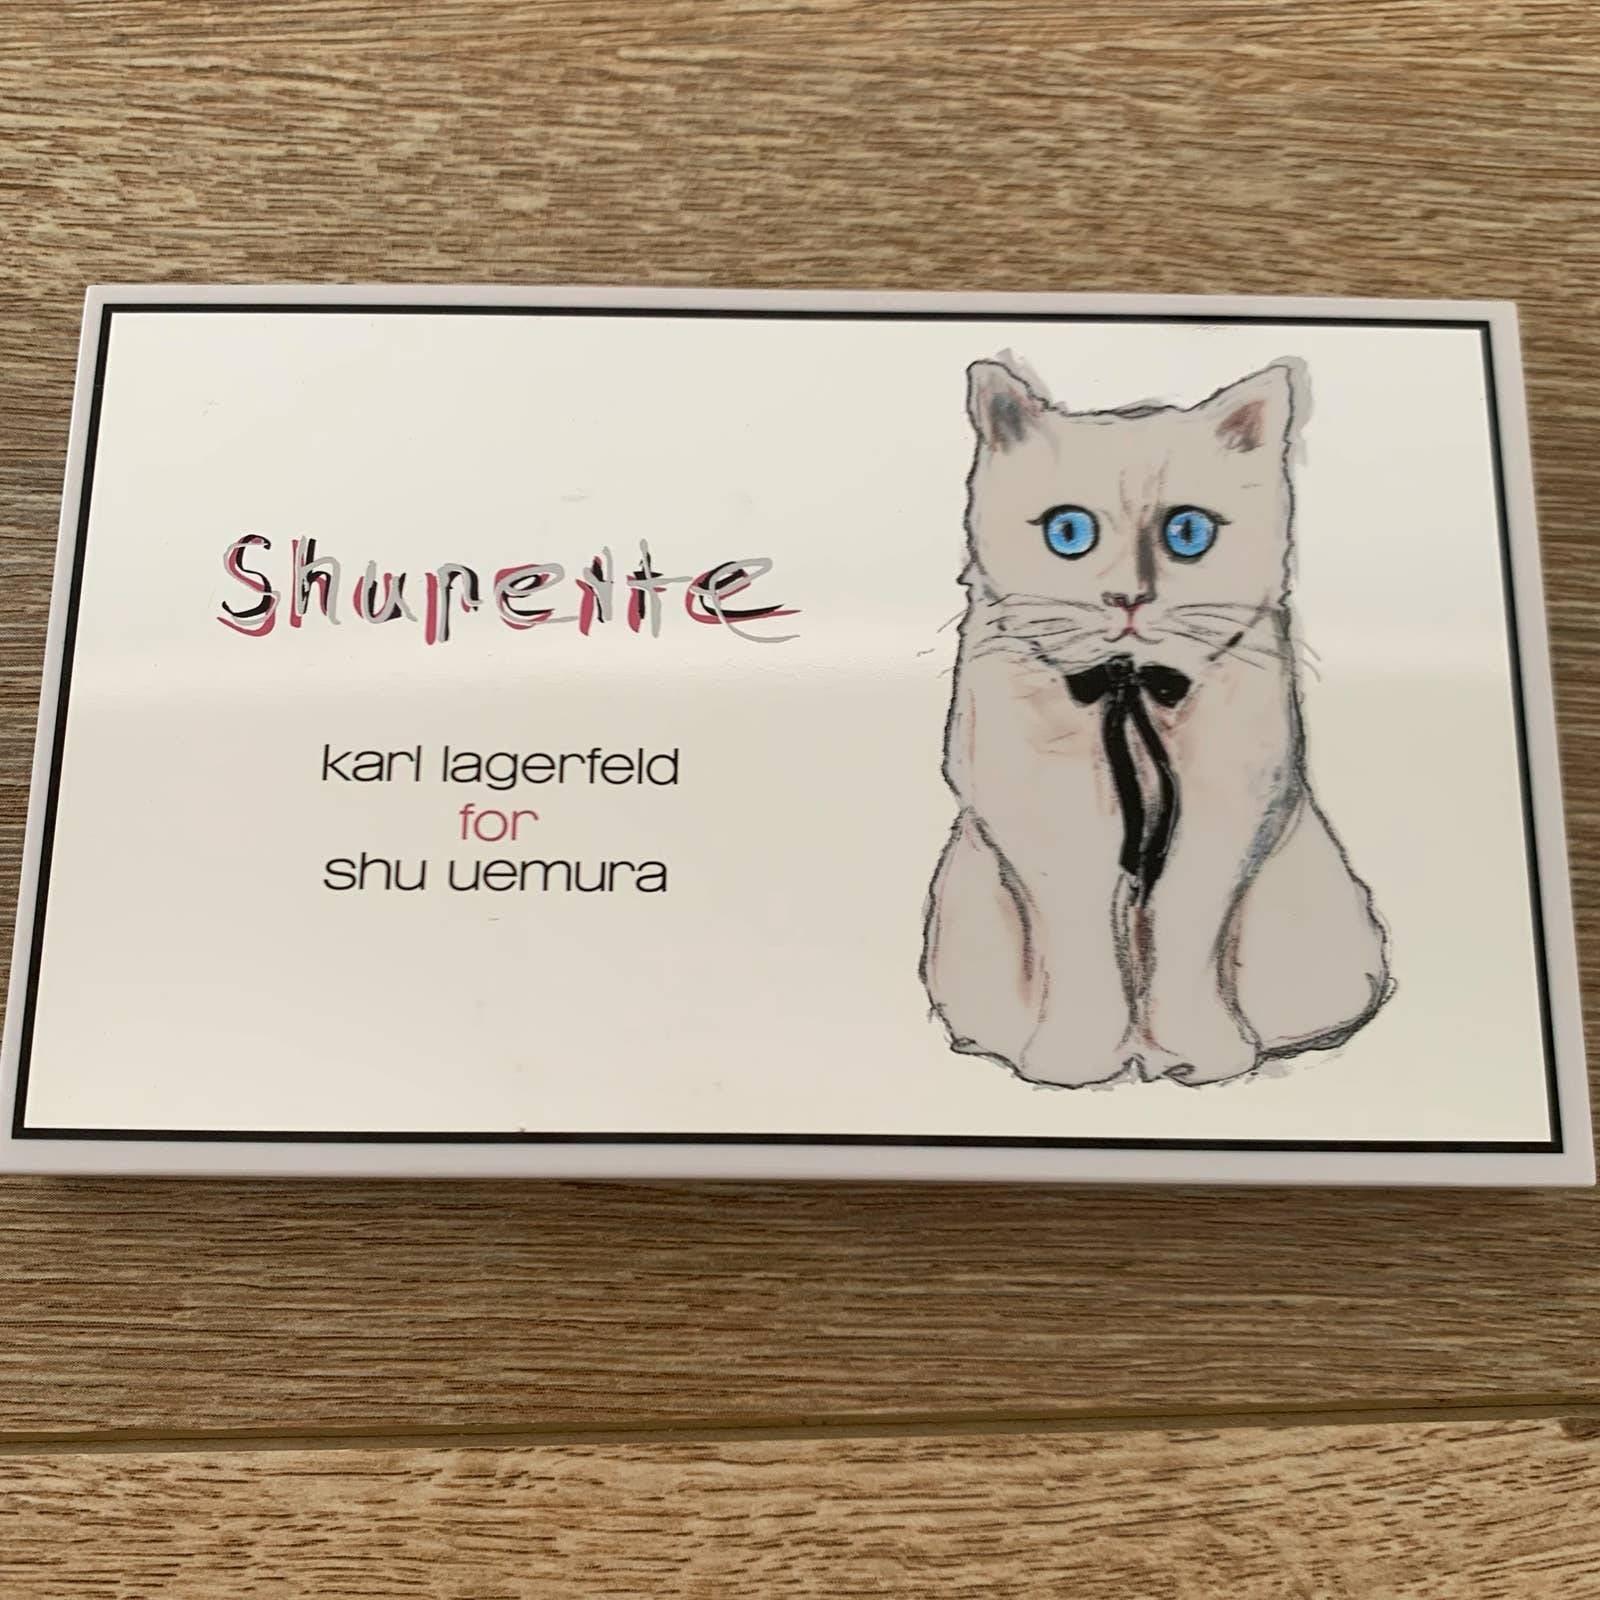 Shu Uemura x Karl Lagerfeld Makeup Set